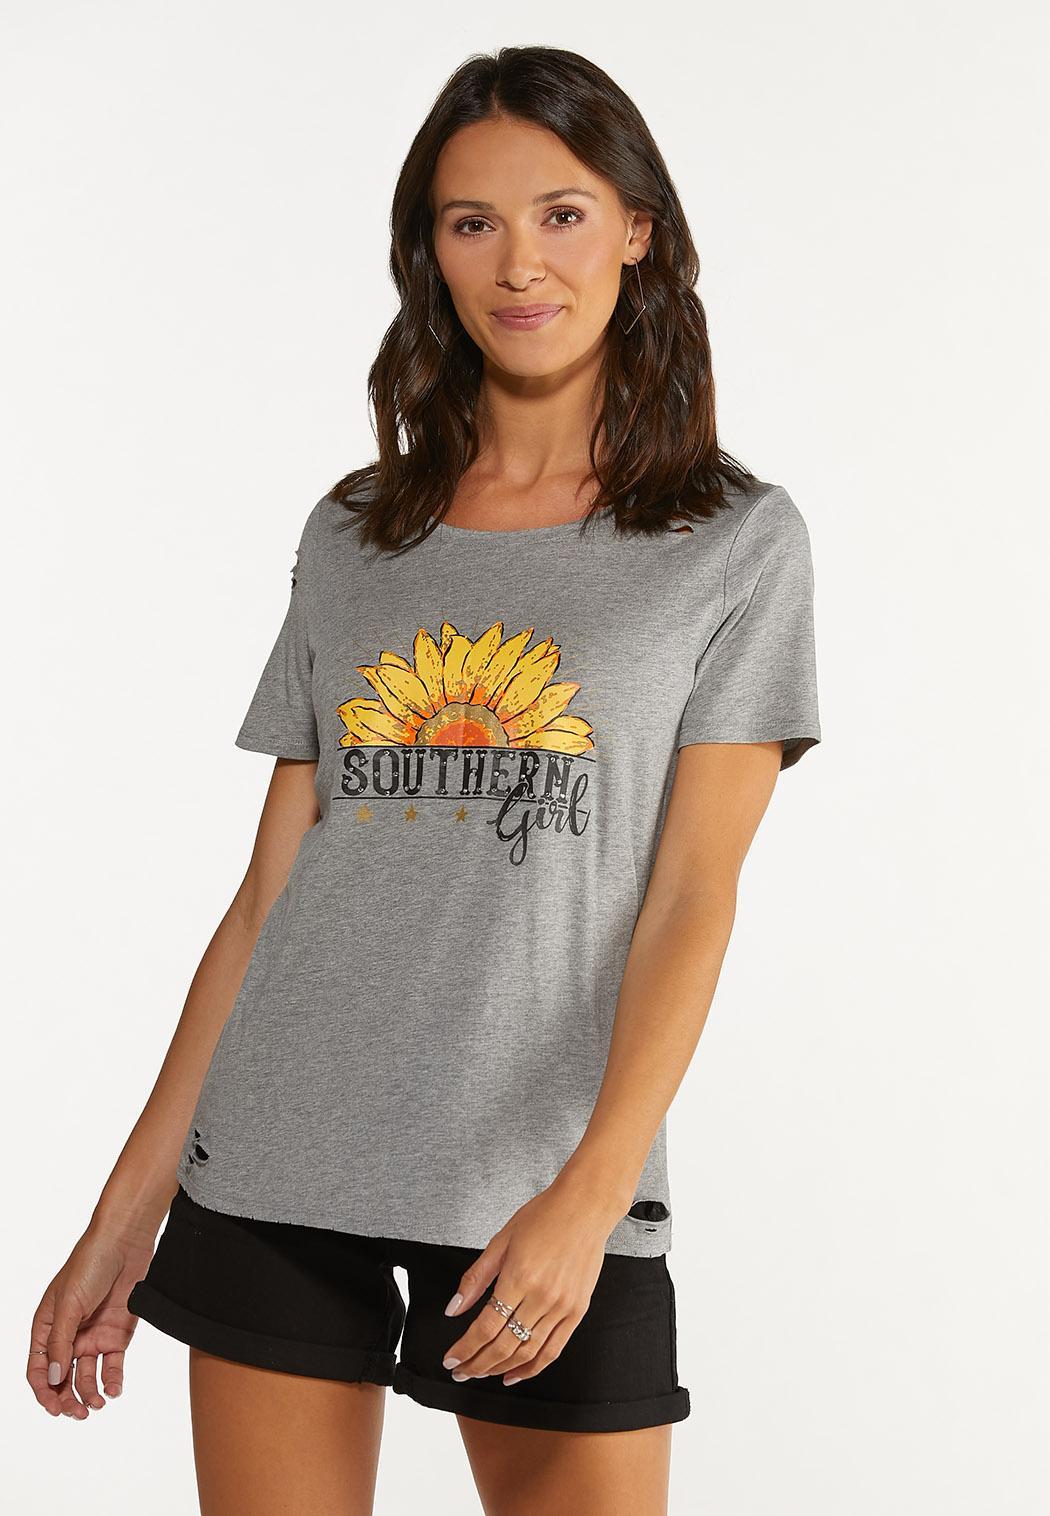 Southern Girl Tee